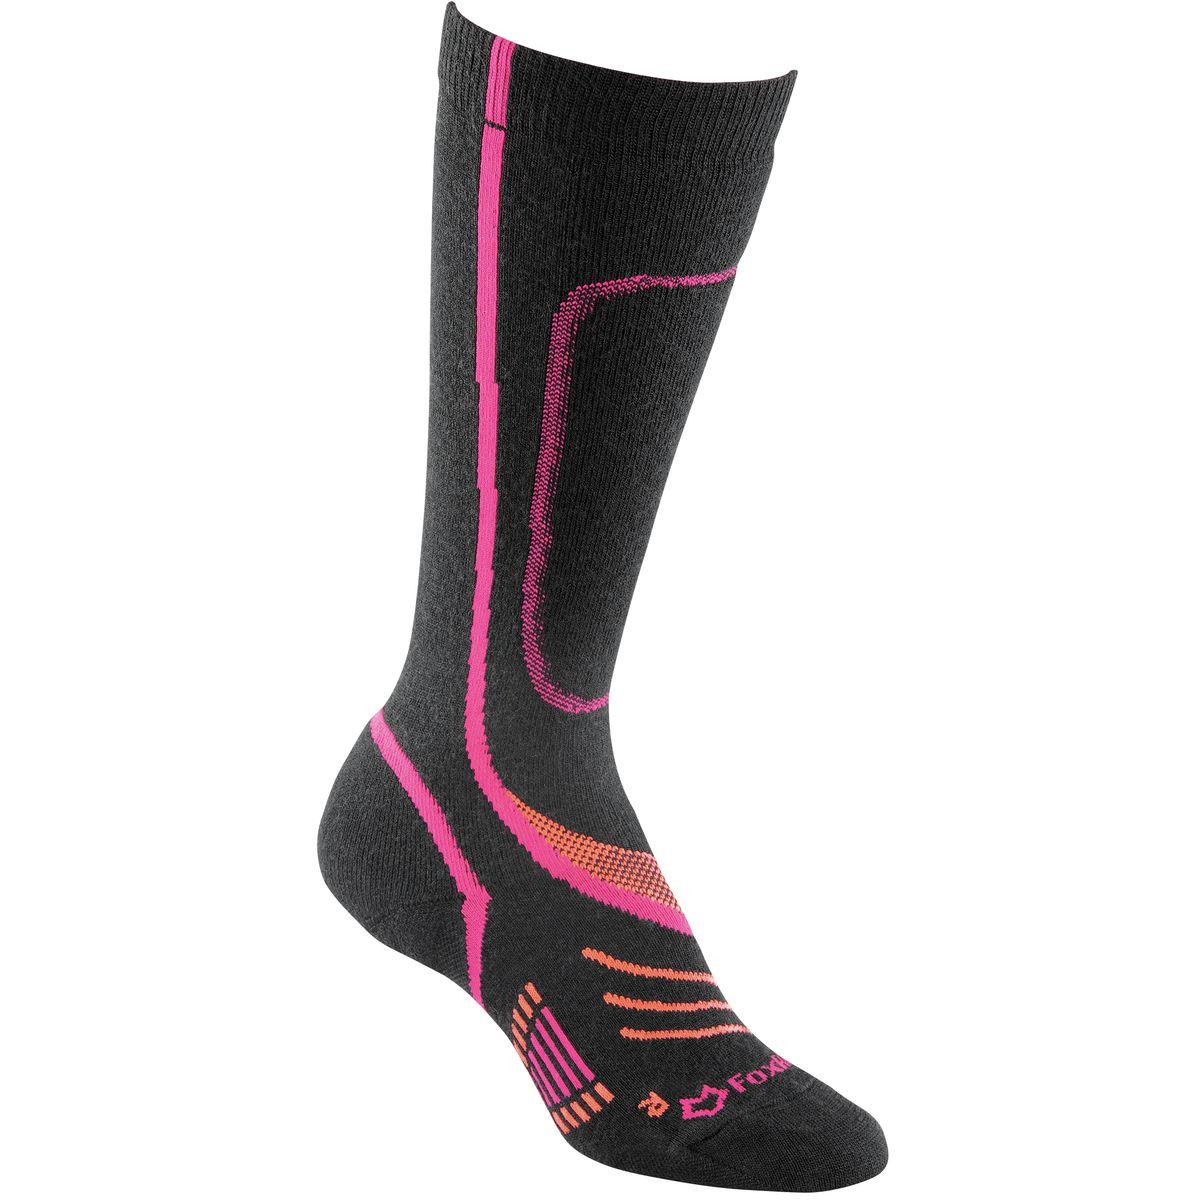 Fox River VVS LW Pro Over The Calf Socks  Womens